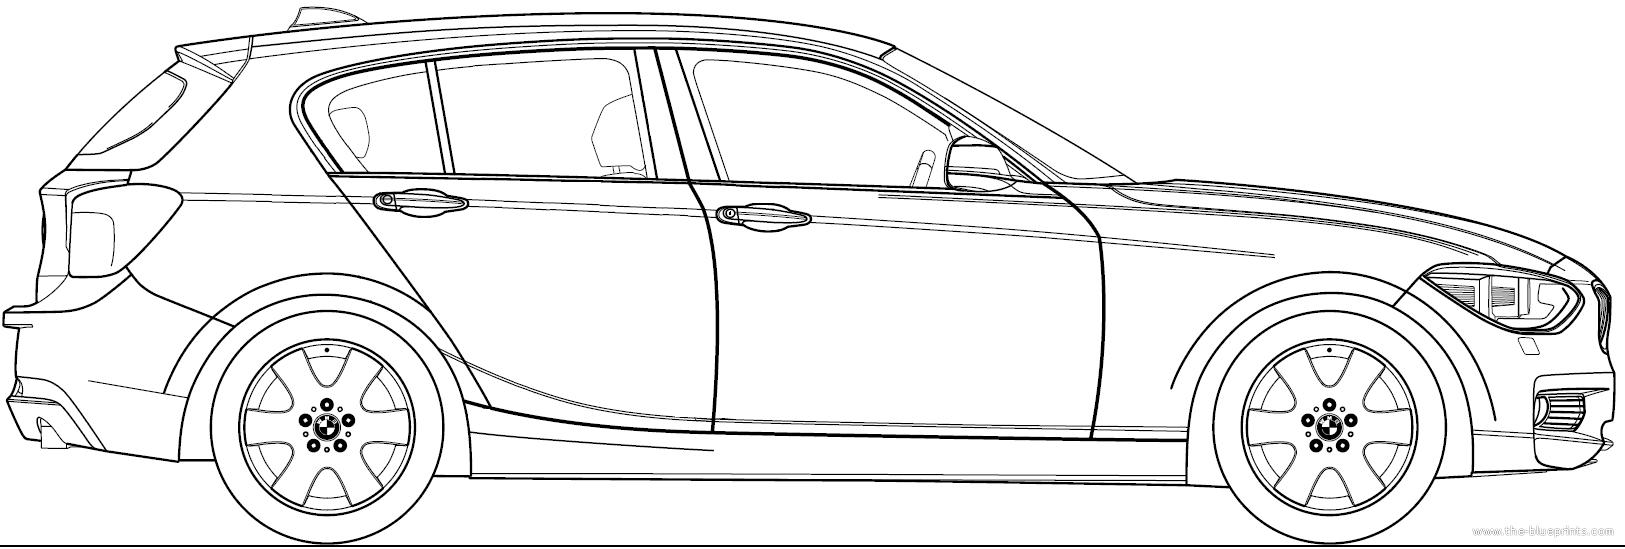 Bmw 3 Series Dimensions VYqe126ya3ACWfzHUzjfMhMzaPKqUzoxdl18cK0whcI moreover 370833393992 further 392095 Toyota Qashqai Dimensions besides 31563 Hyundai Launch B Segment Car I20 Soon 7 further 44 7cm Motorcycle Wiring Diagram. on bmw x3 size dimensions